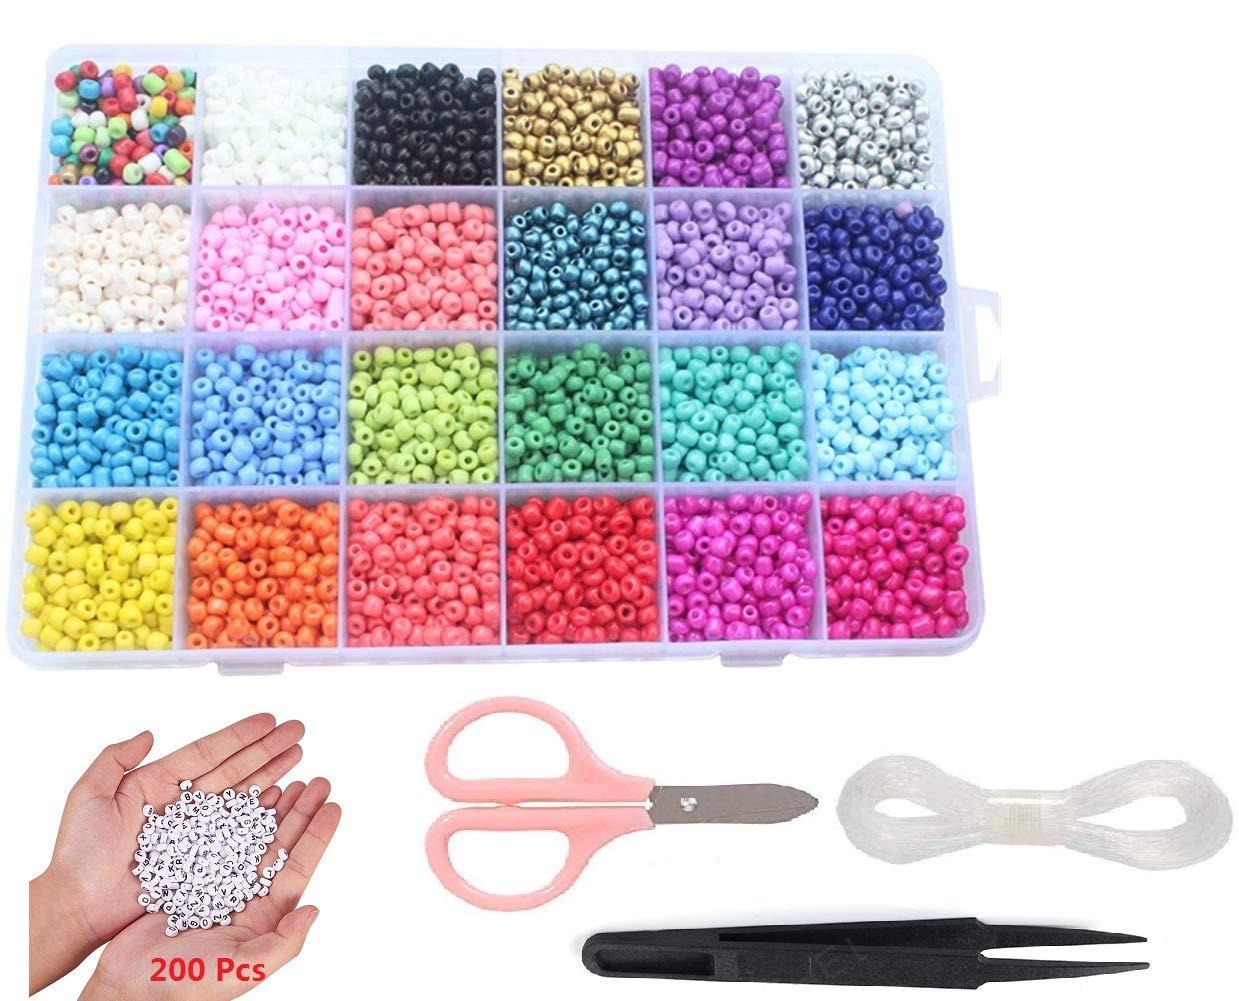 7200pcs Alphabet Bracelets Scissors Tweezers